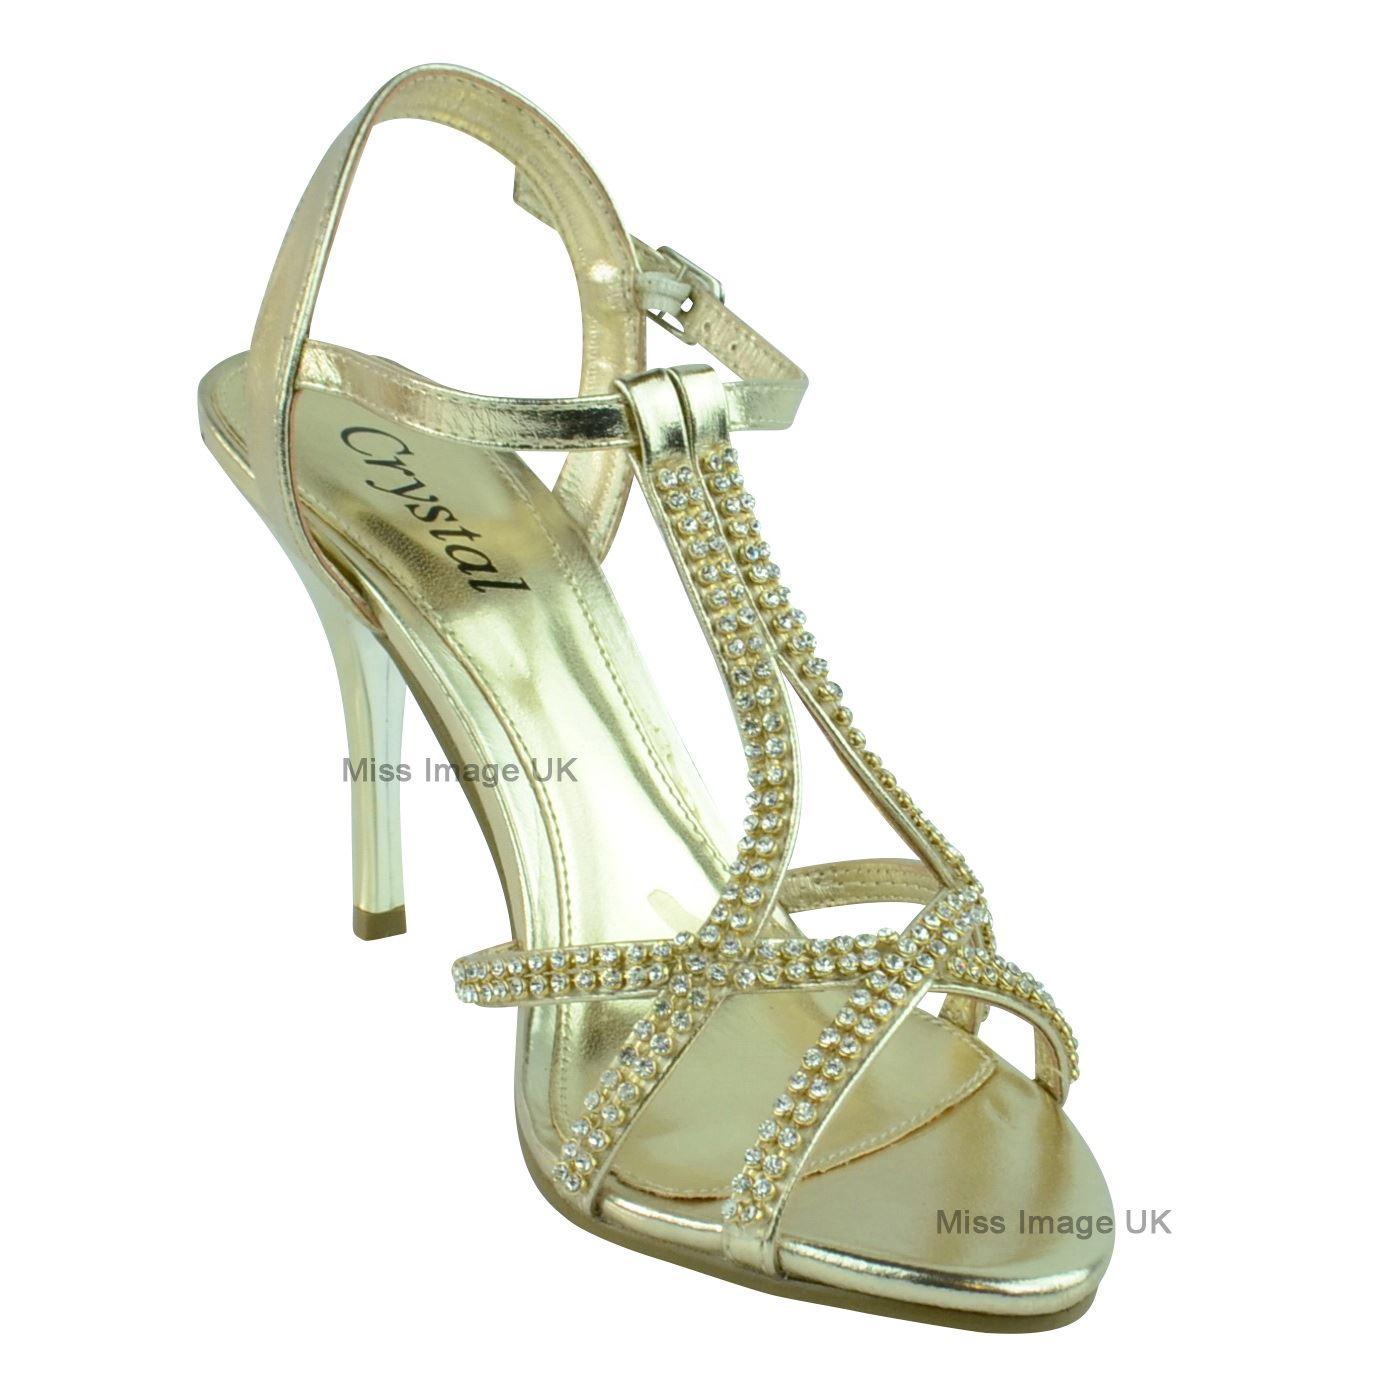 Mujer señoras de Boda nupcial Baile de graduación Fiesta Zapato Taco Alto Sandalias Zapatos Talla